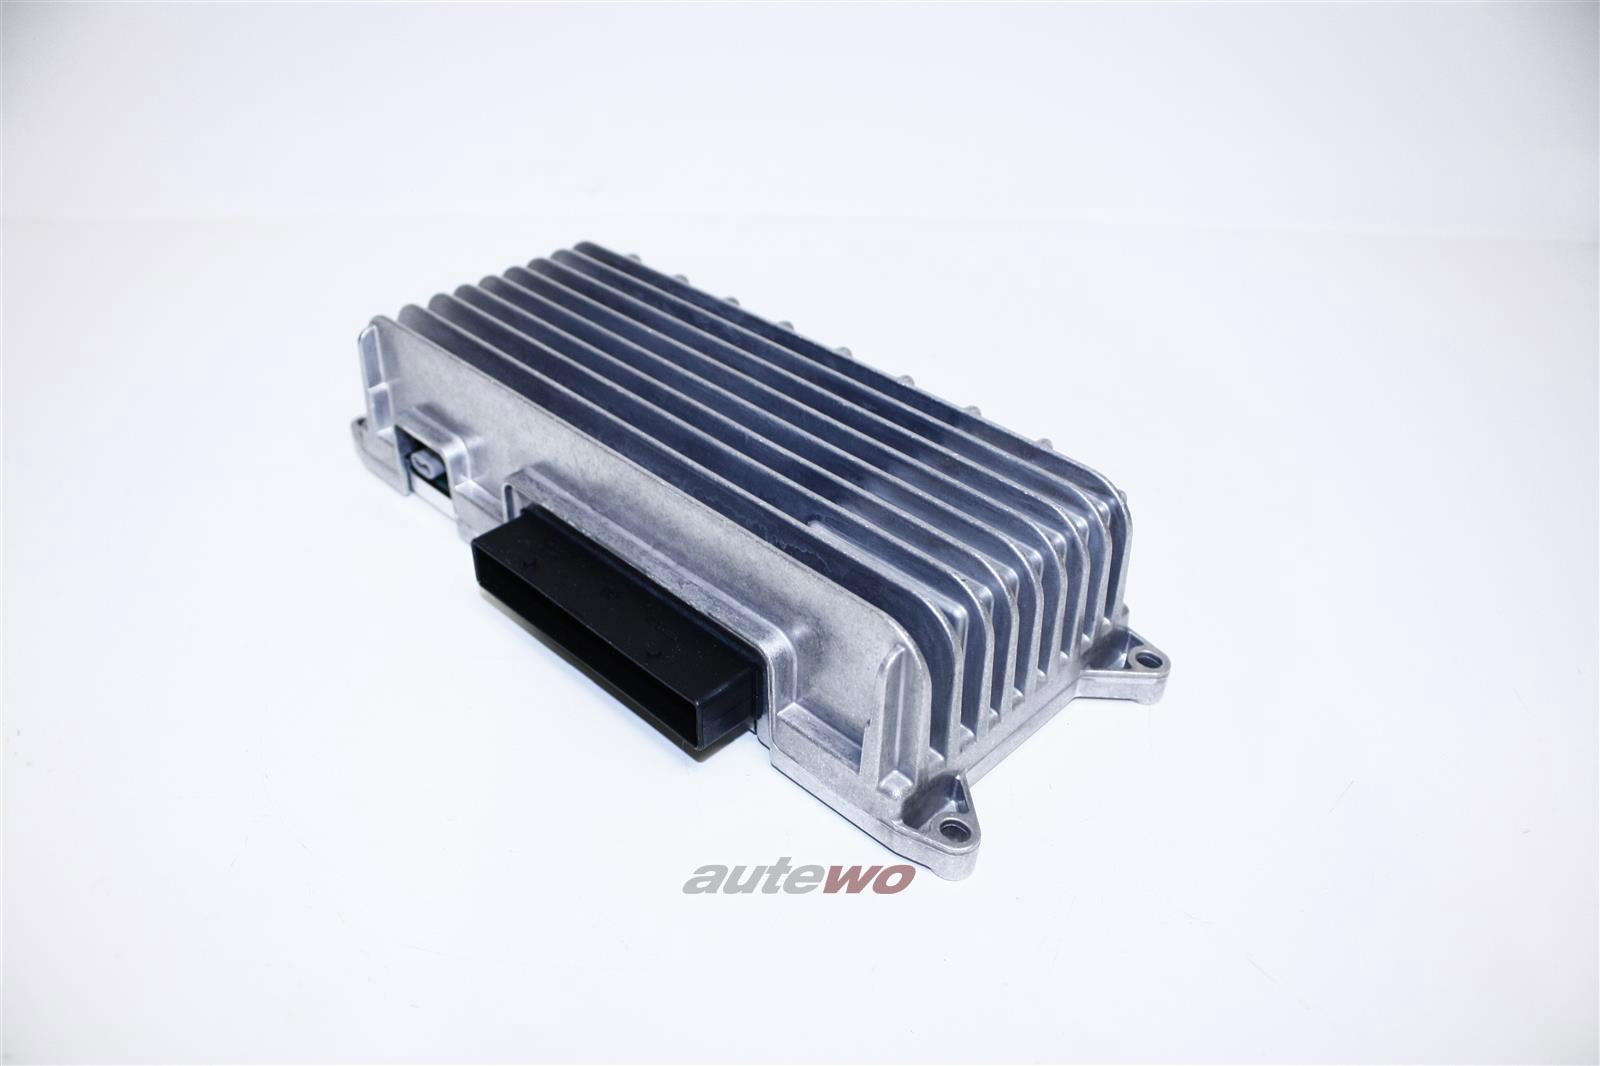 8T0035223AE/R NEU Audi A4 8K/A5 8T Verstärker für Soundsystem